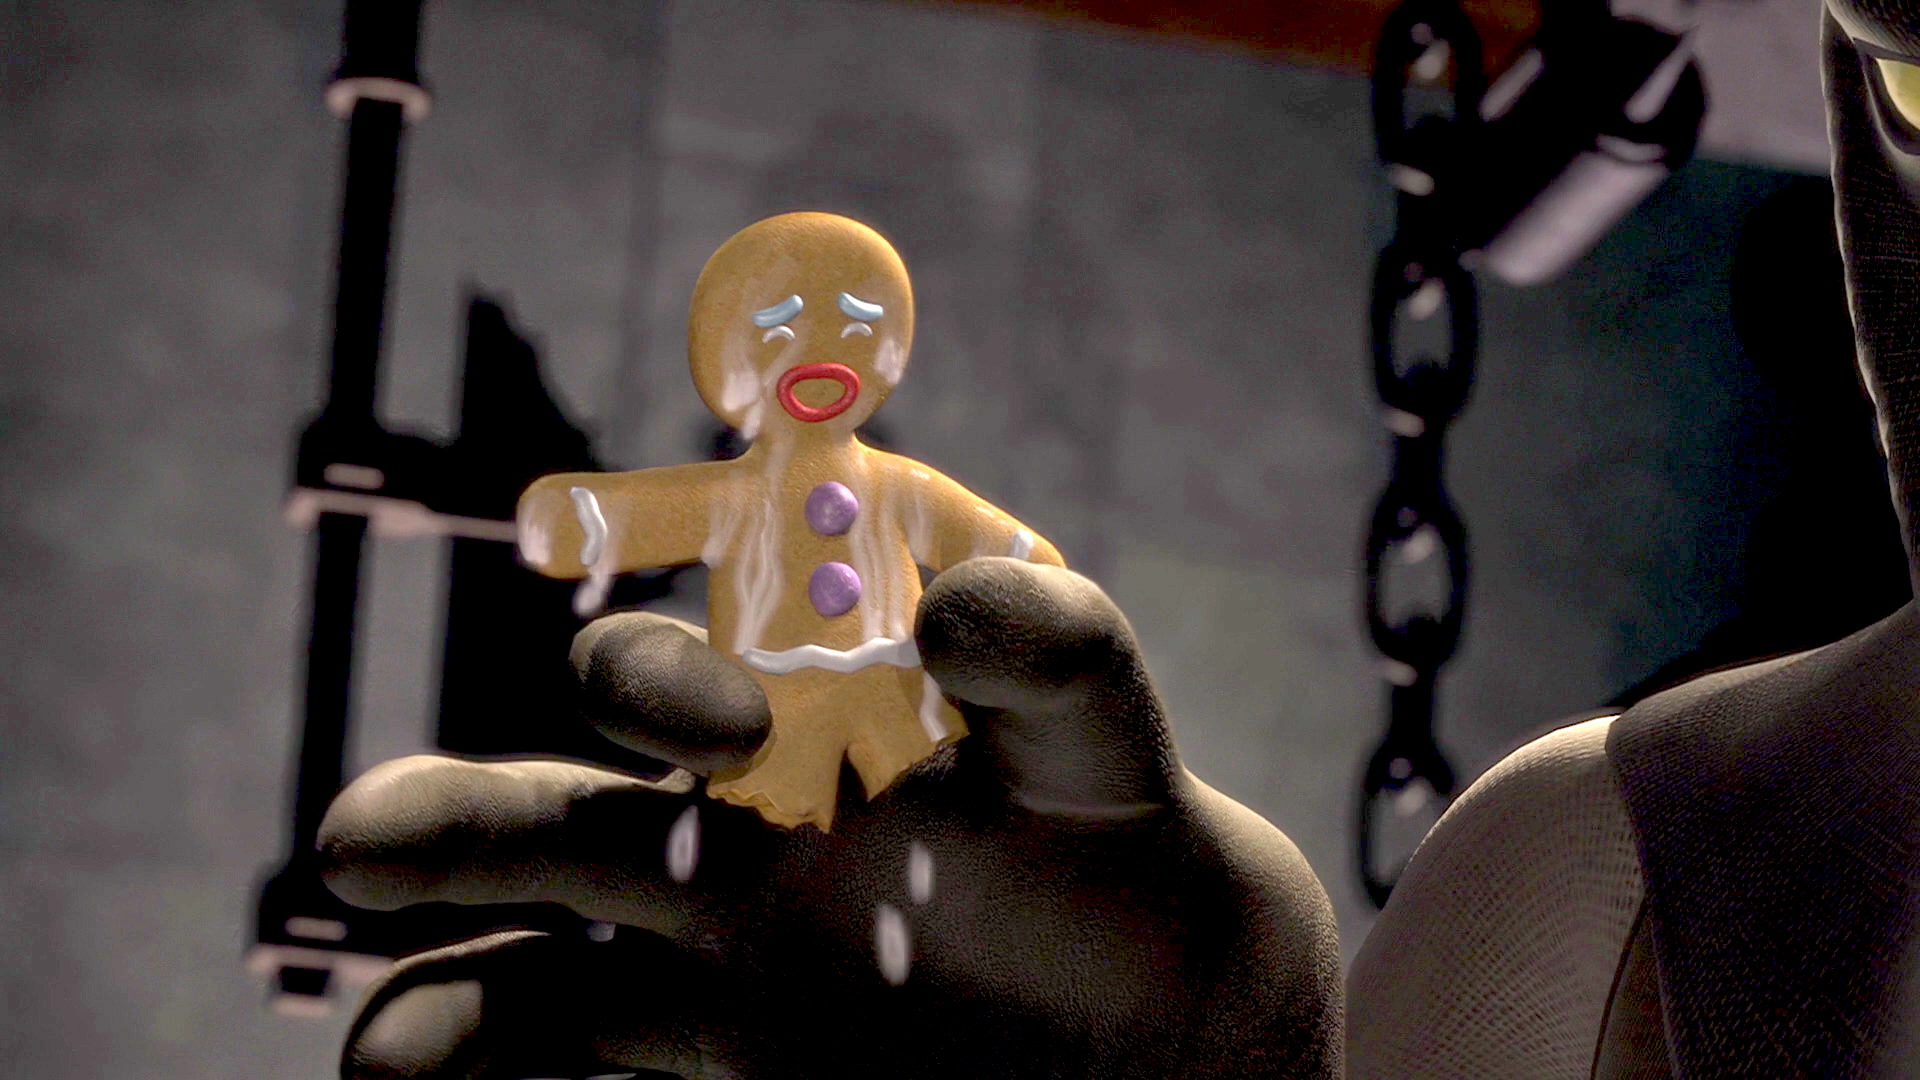 Gingerbread Man gets dunked in milk in Shrek 1